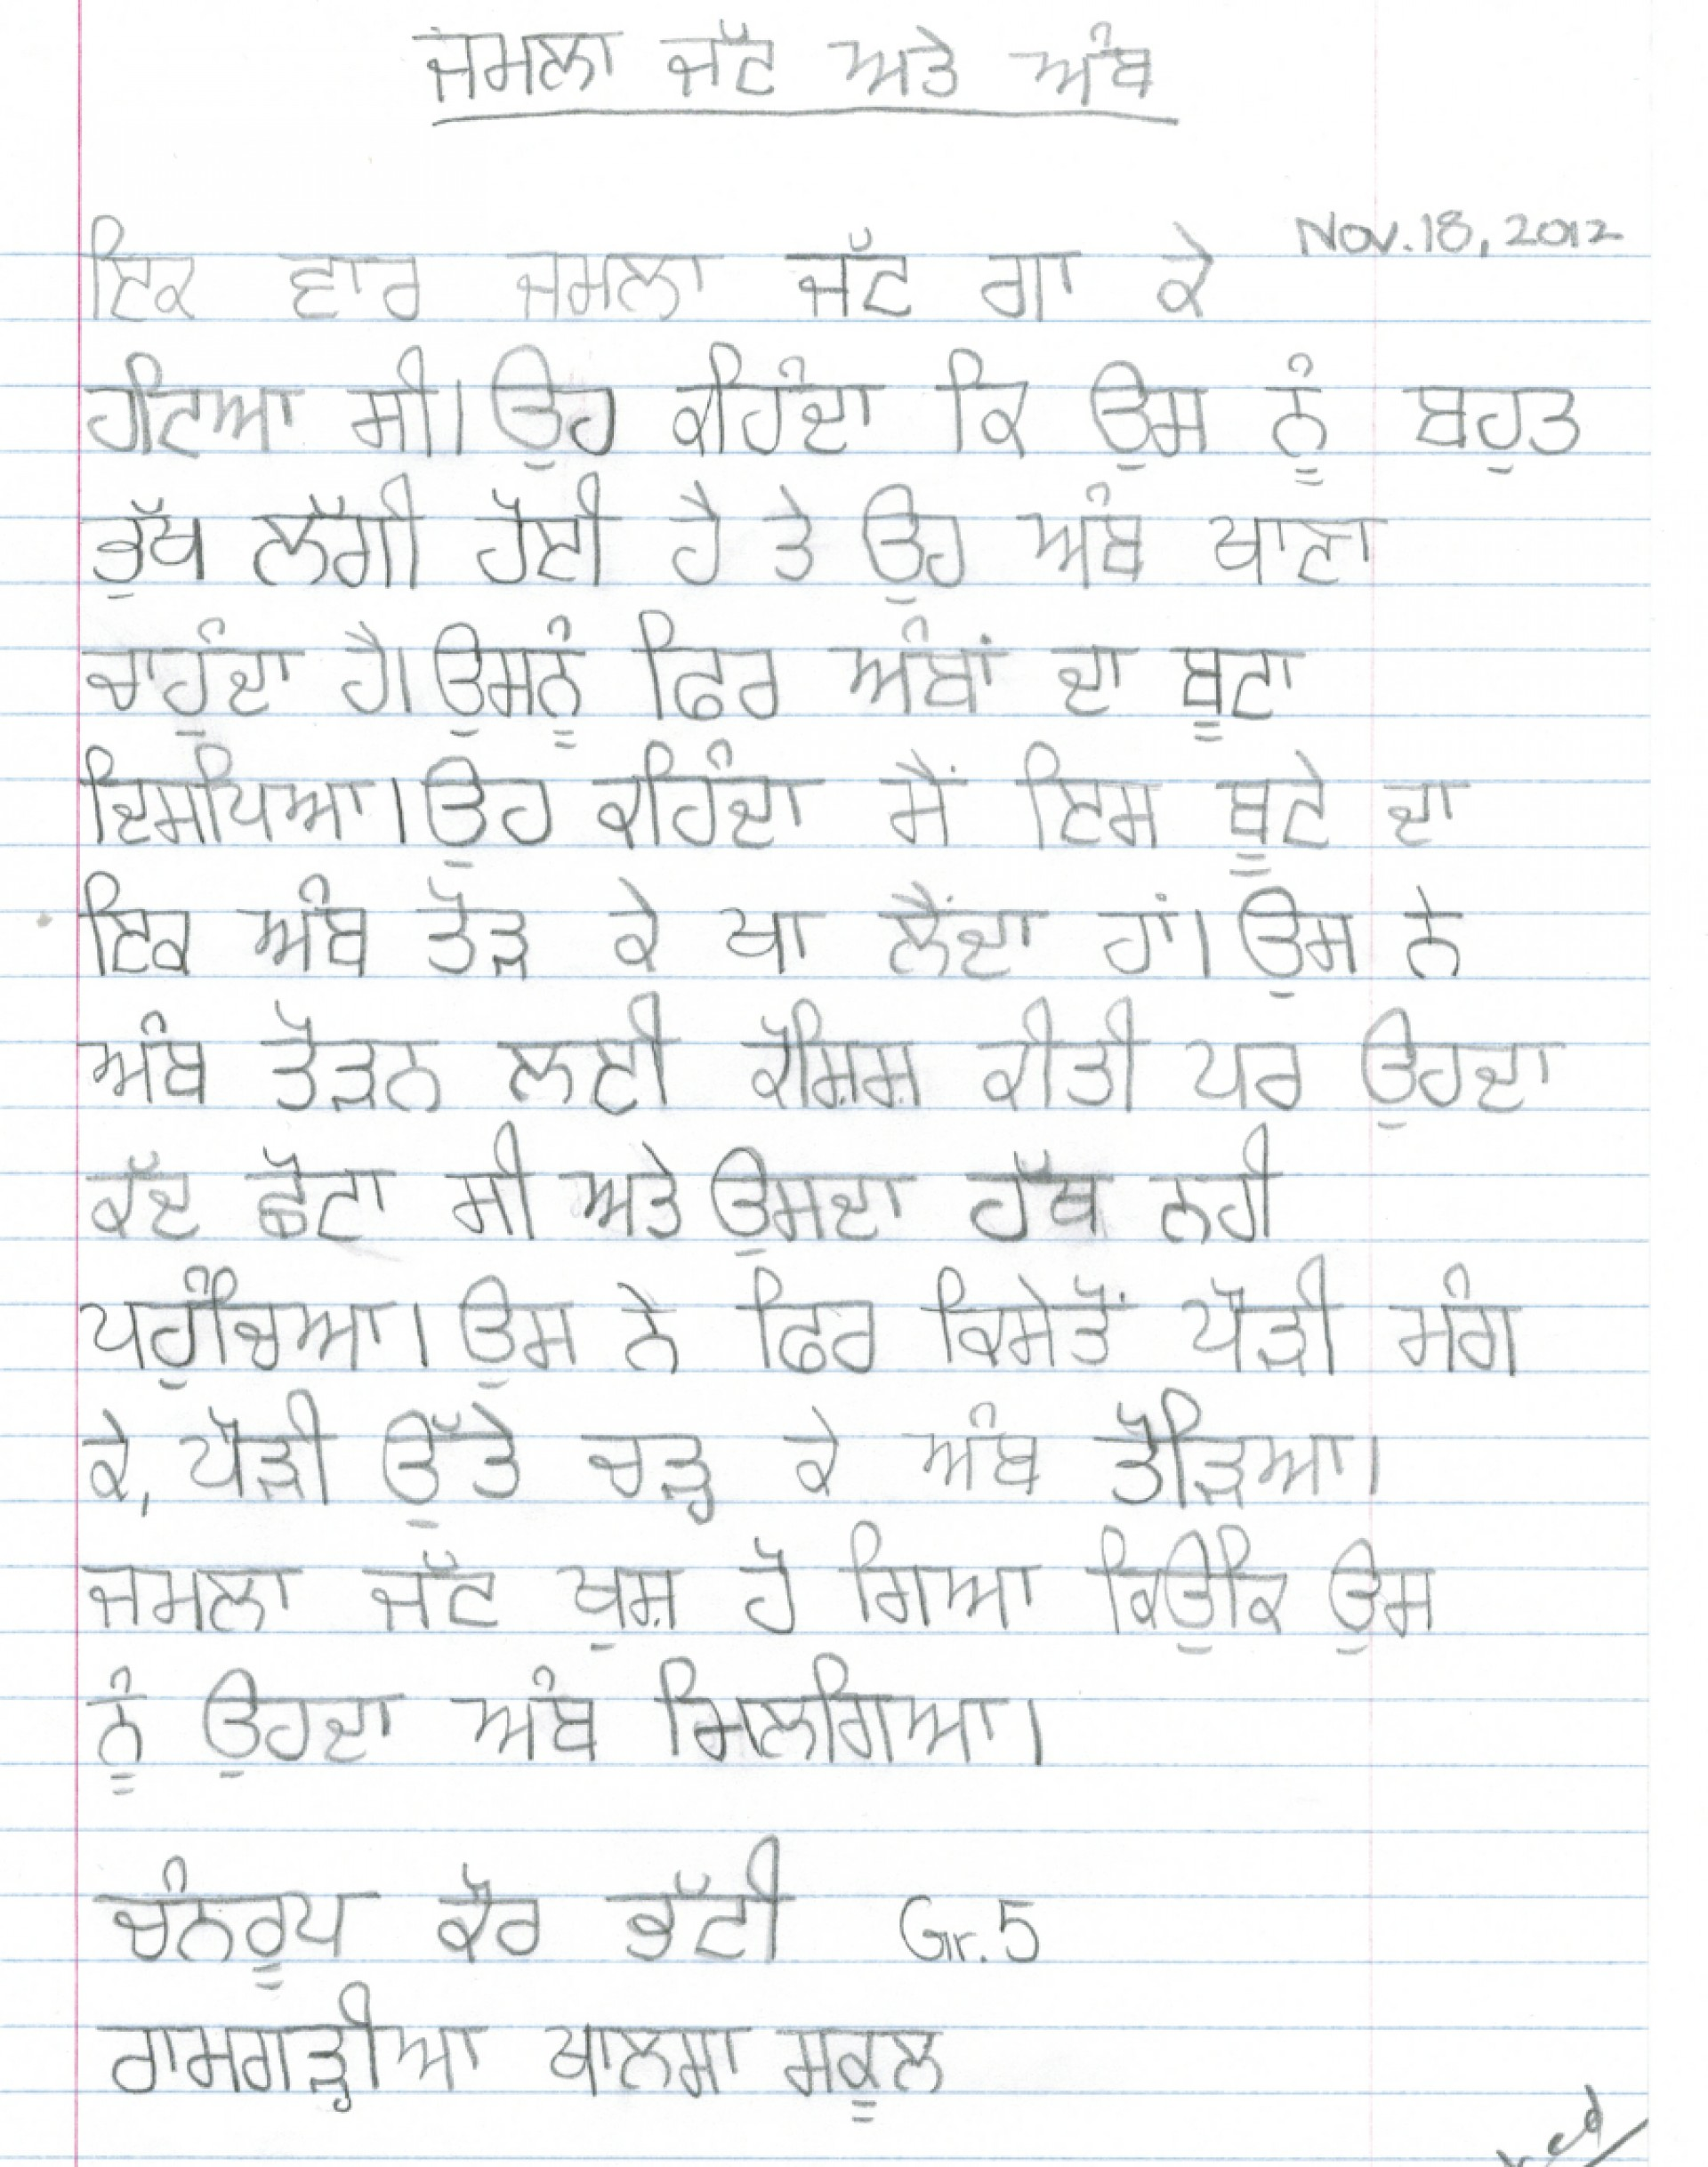 011 Essay Example Screen252bshot252b2013 20252bat252b3 36252bpm My Most Influential Fascinating Teacher 1920